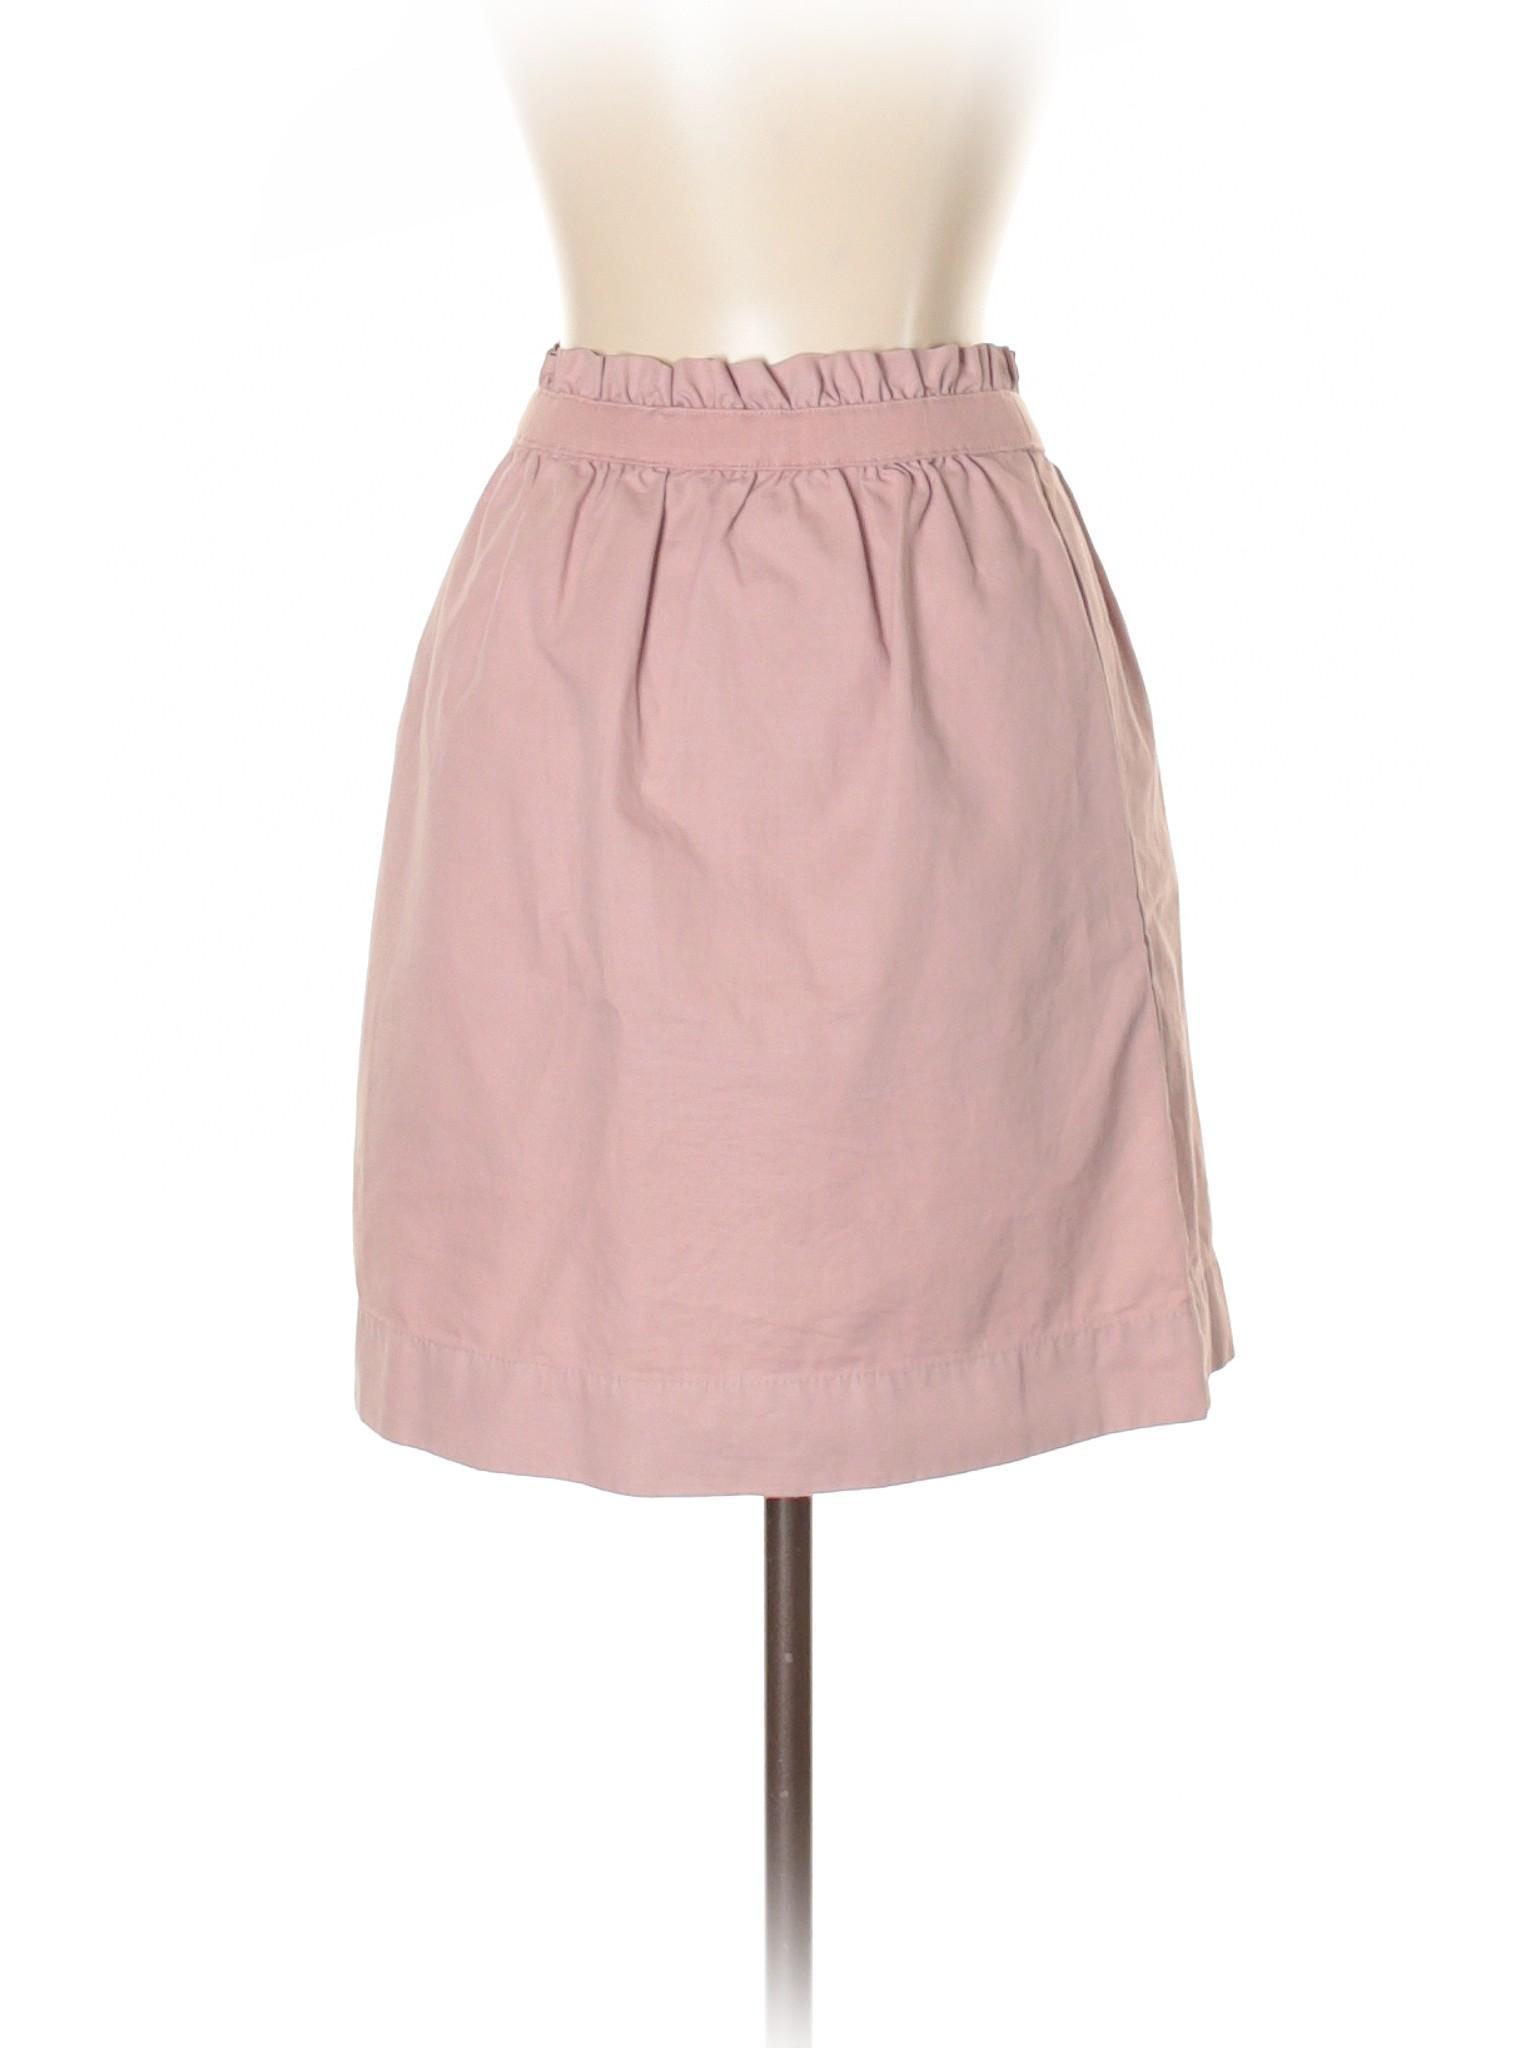 Boutique Boutique Skirt Casual Skirt Casual Boutique Boutique Skirt Skirt Casual Casual wA5wr8